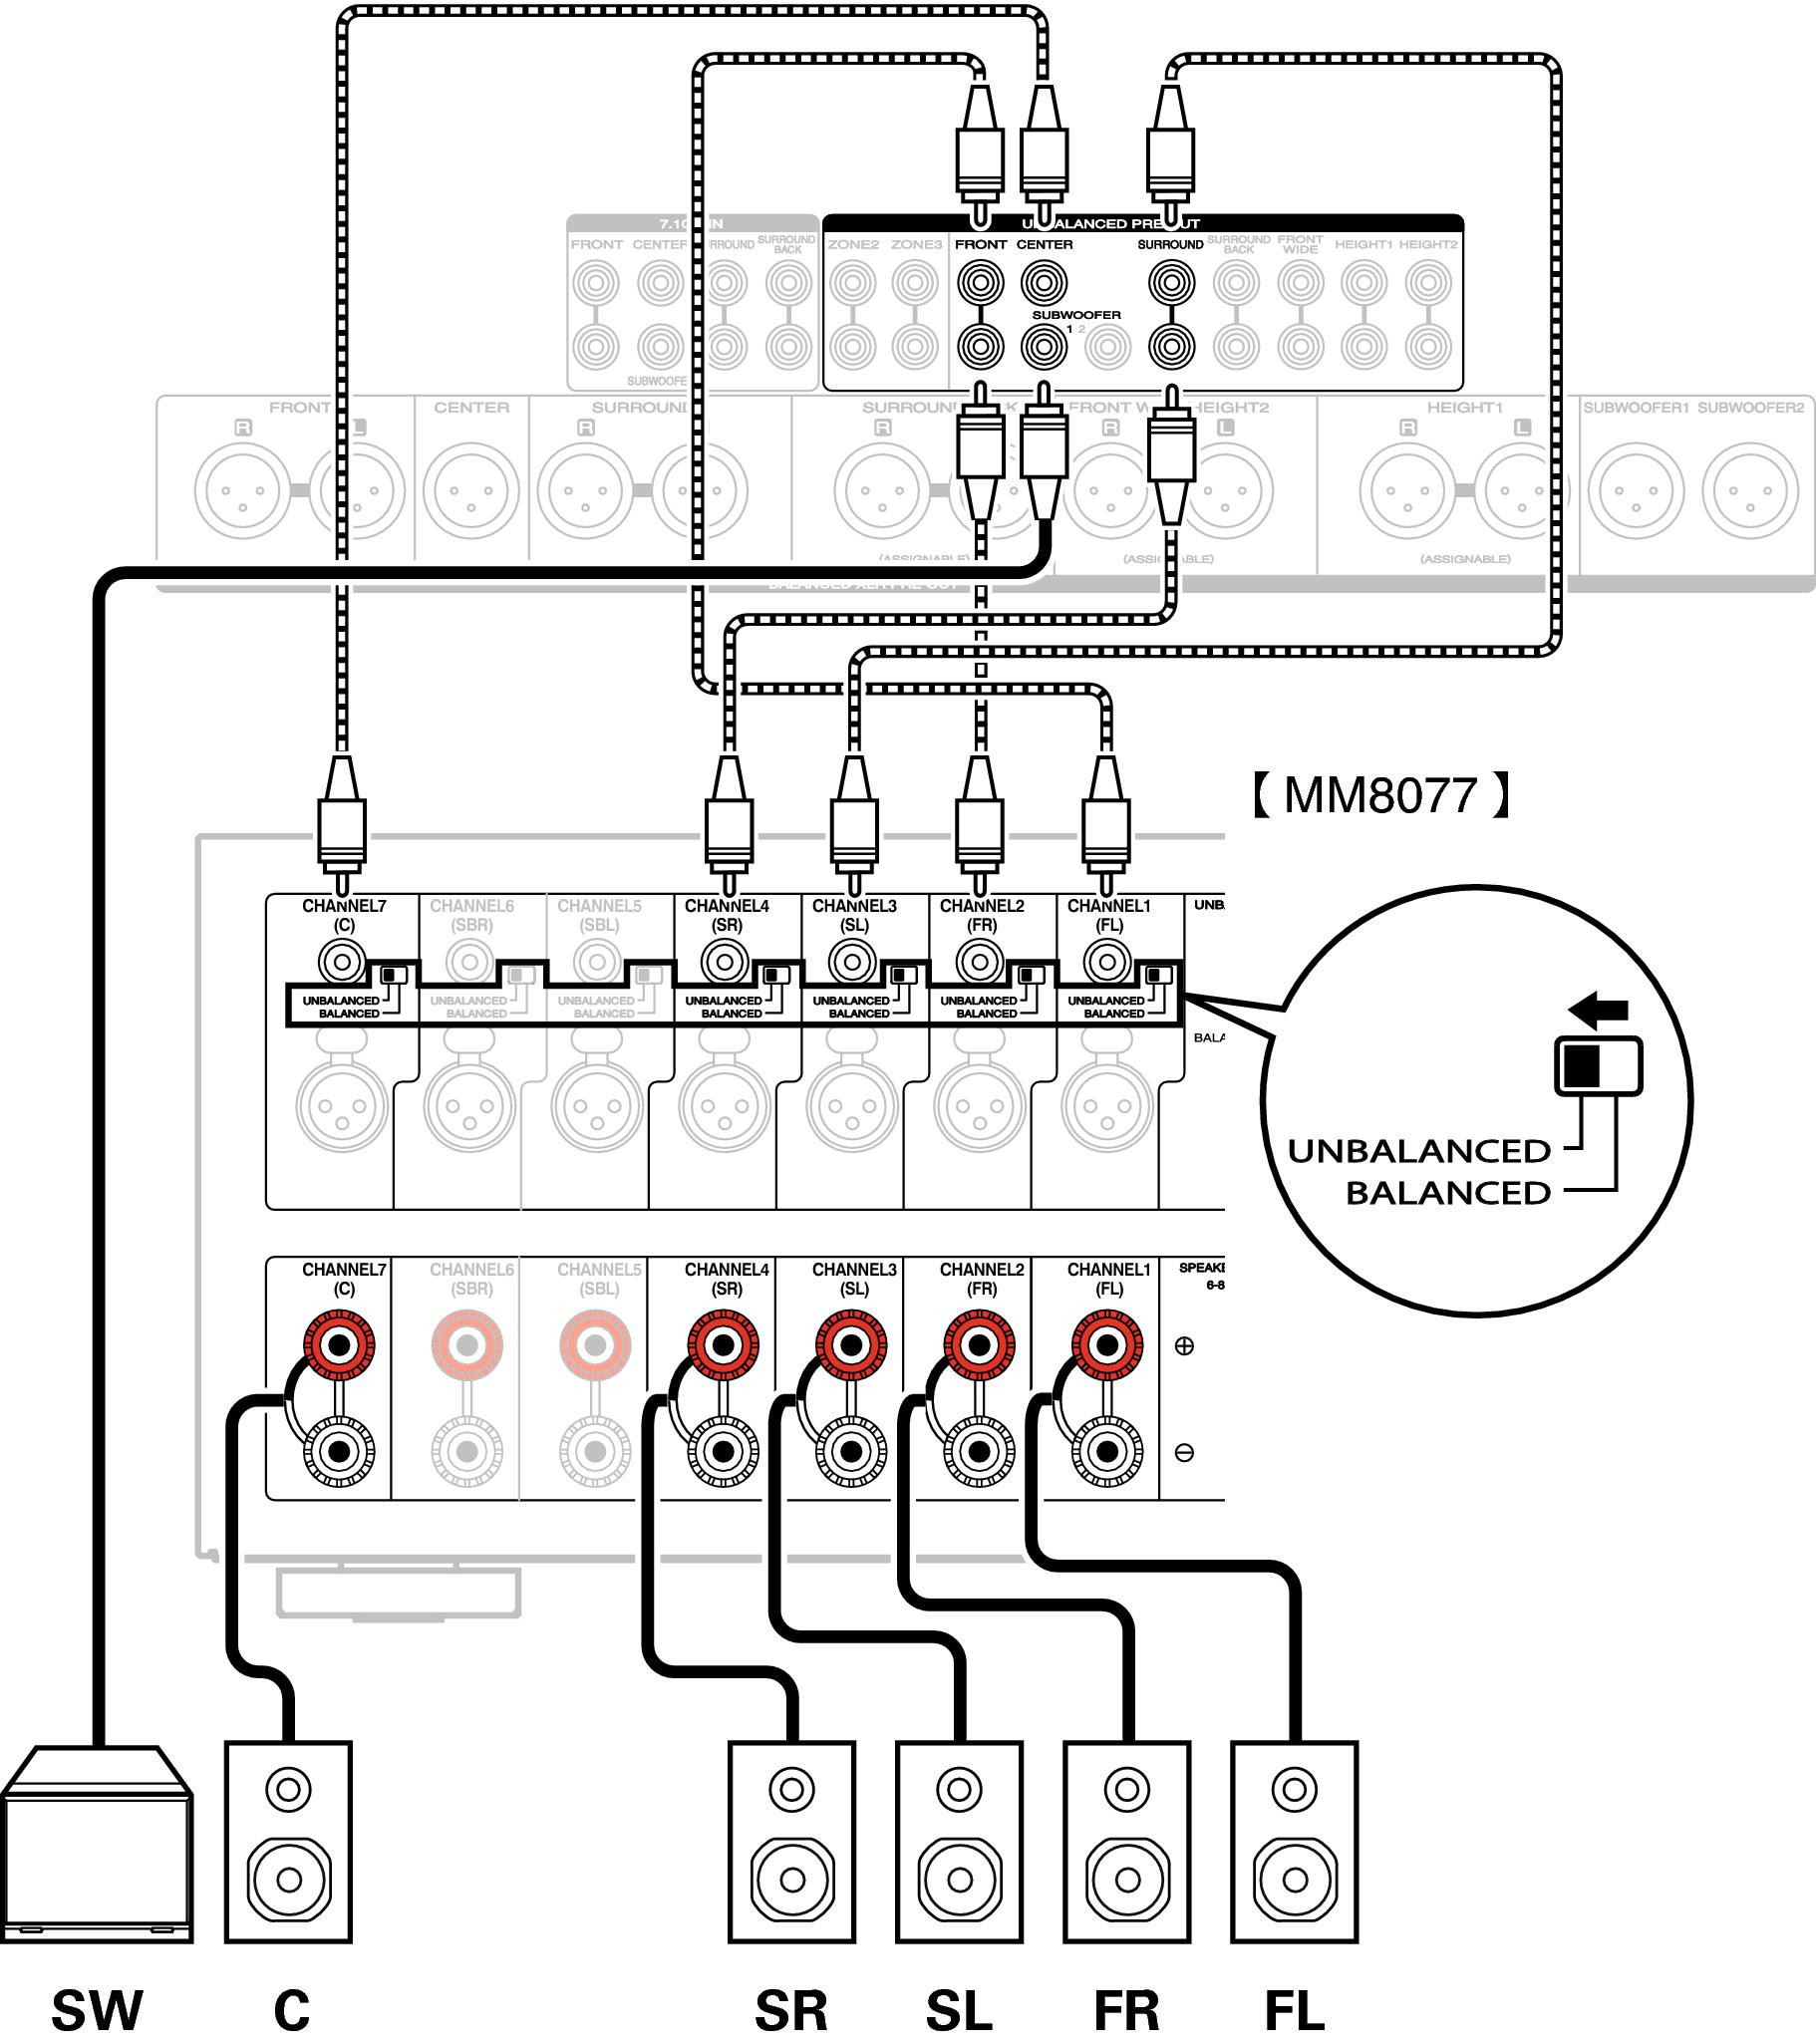 Speaker Configuration And Amp Assign Settings Av8802a This Diagram Shows A 51 Surround Sound Setup Conne Sp Av7702u